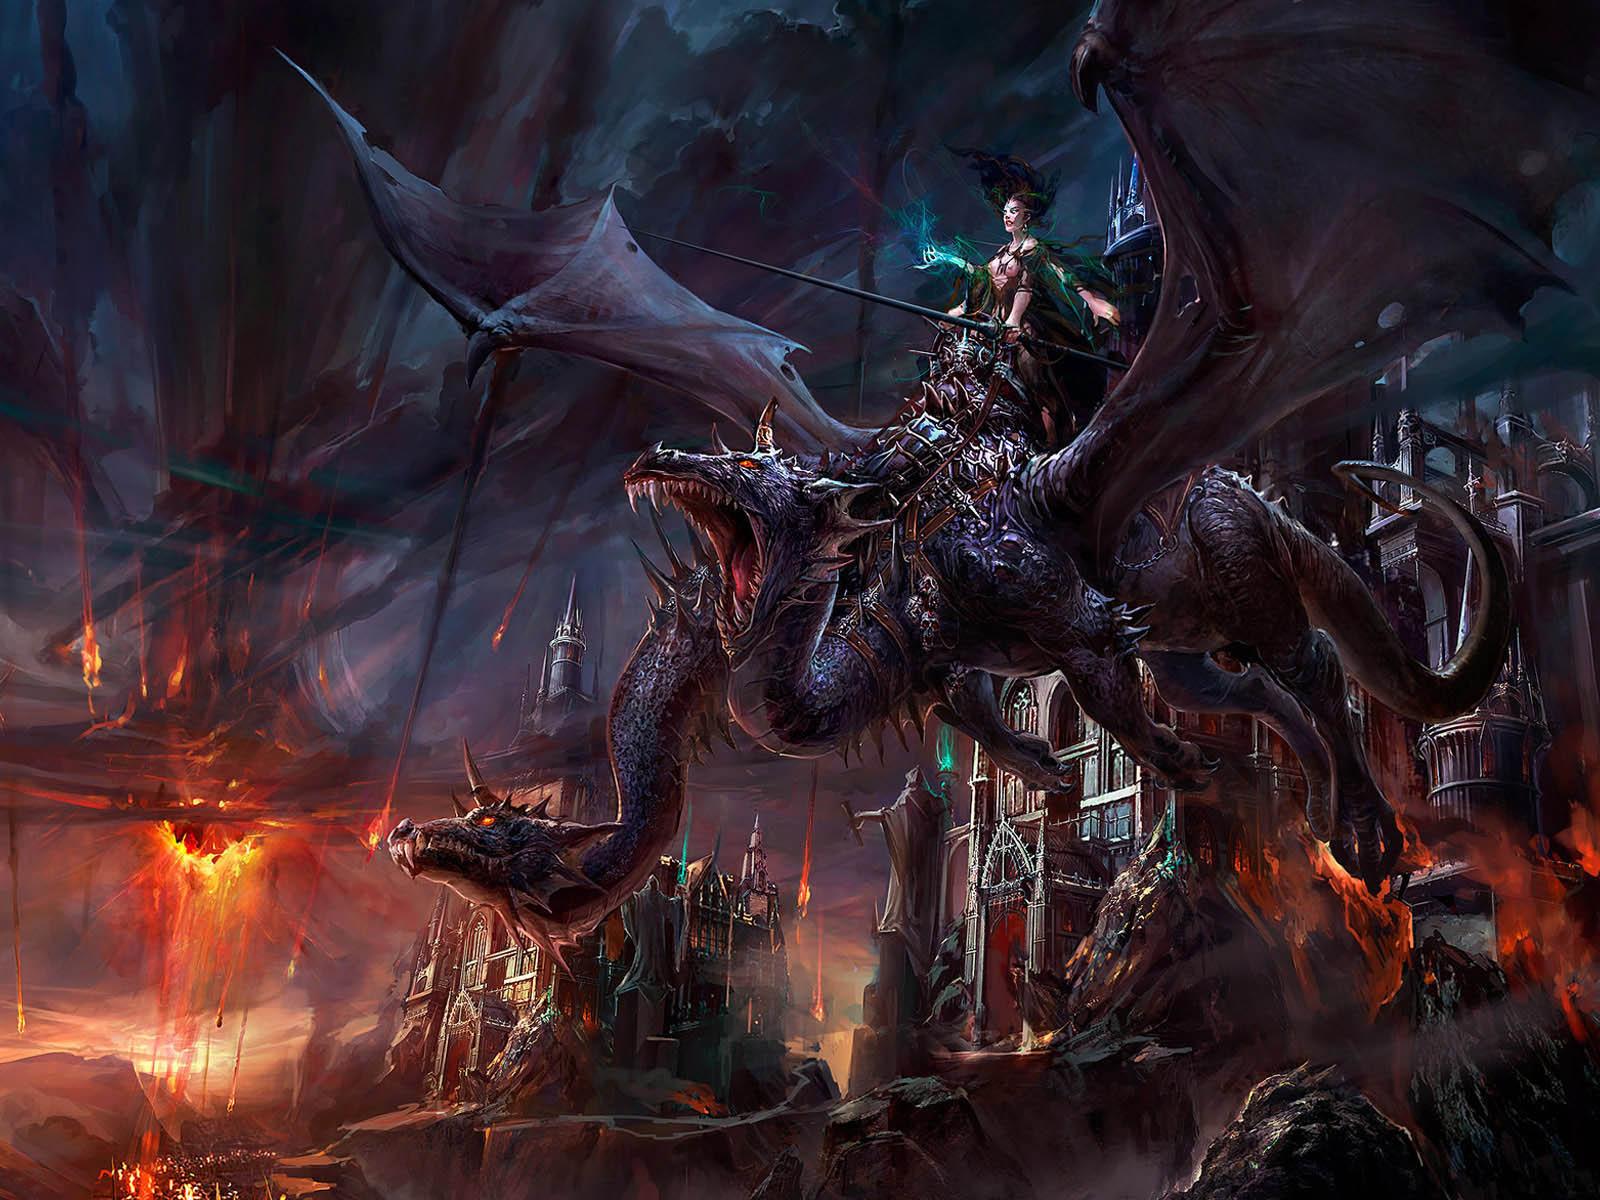 http://www.zastavki.com/pictures/1600x1200/2008/Drawn_wallpapers_Two_heads_dragon_007283_.jpg